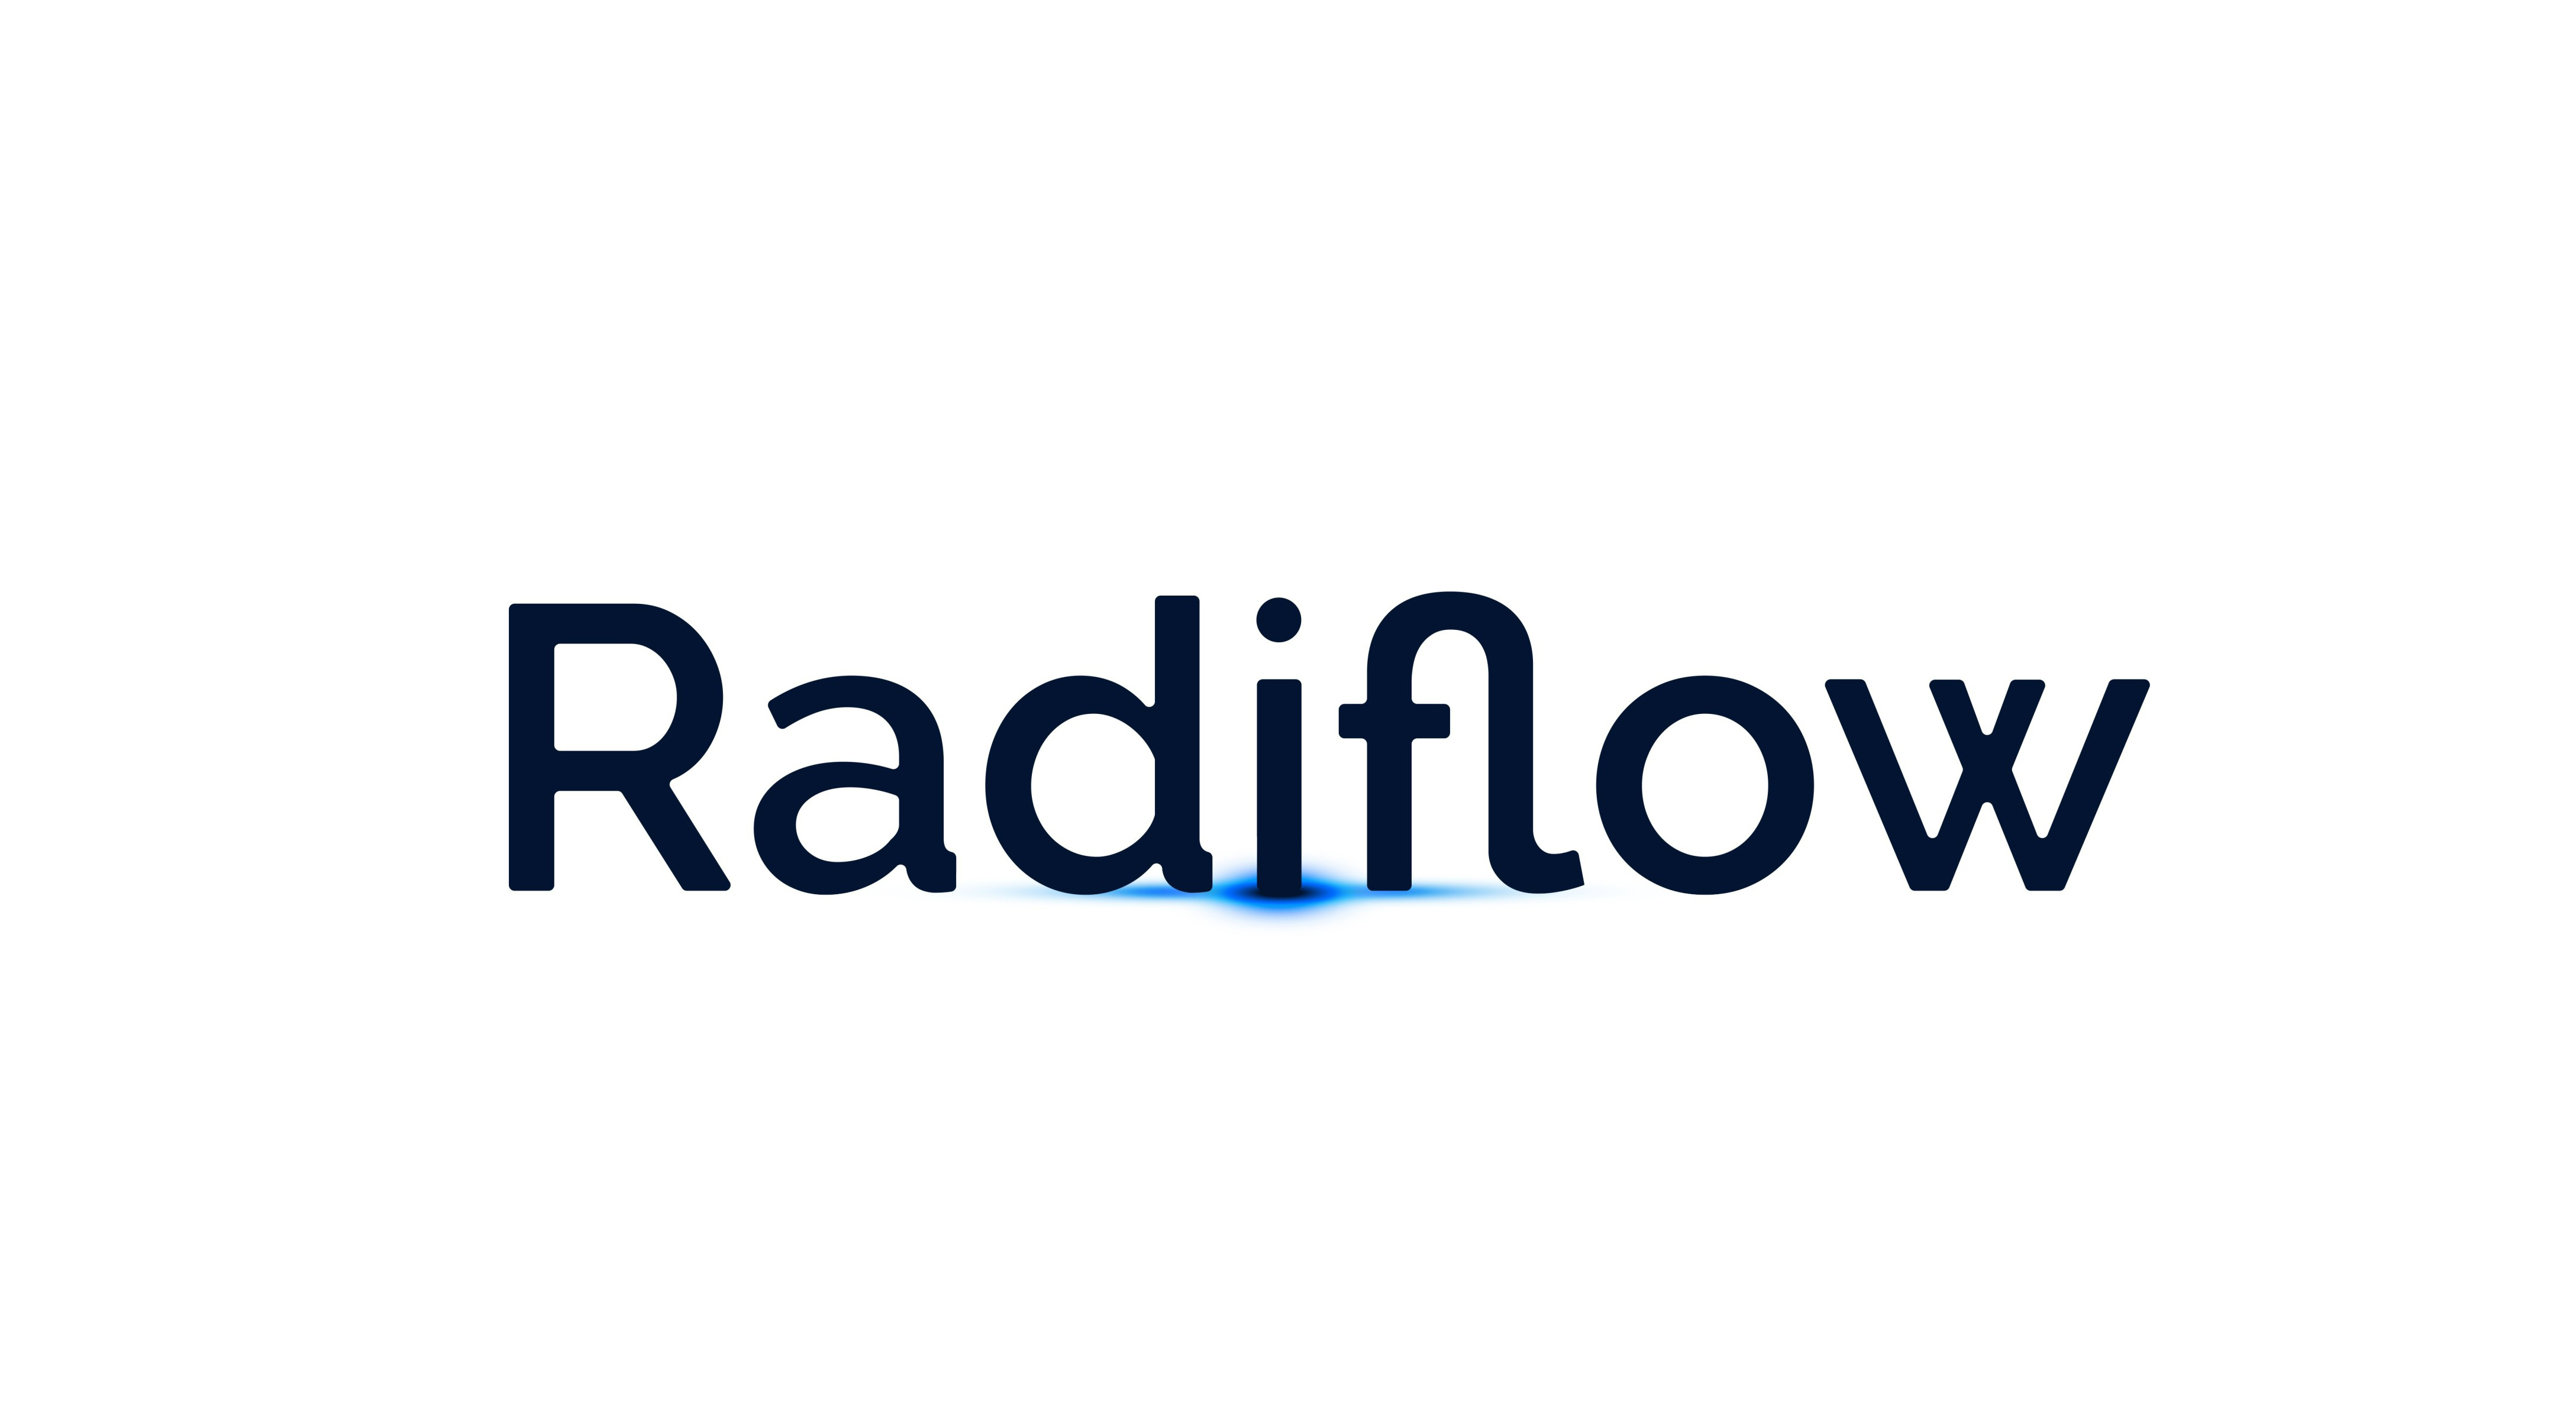 Radiflow's New CIARA Release Revolutionizes Cybersecurity with OT Risk Platform